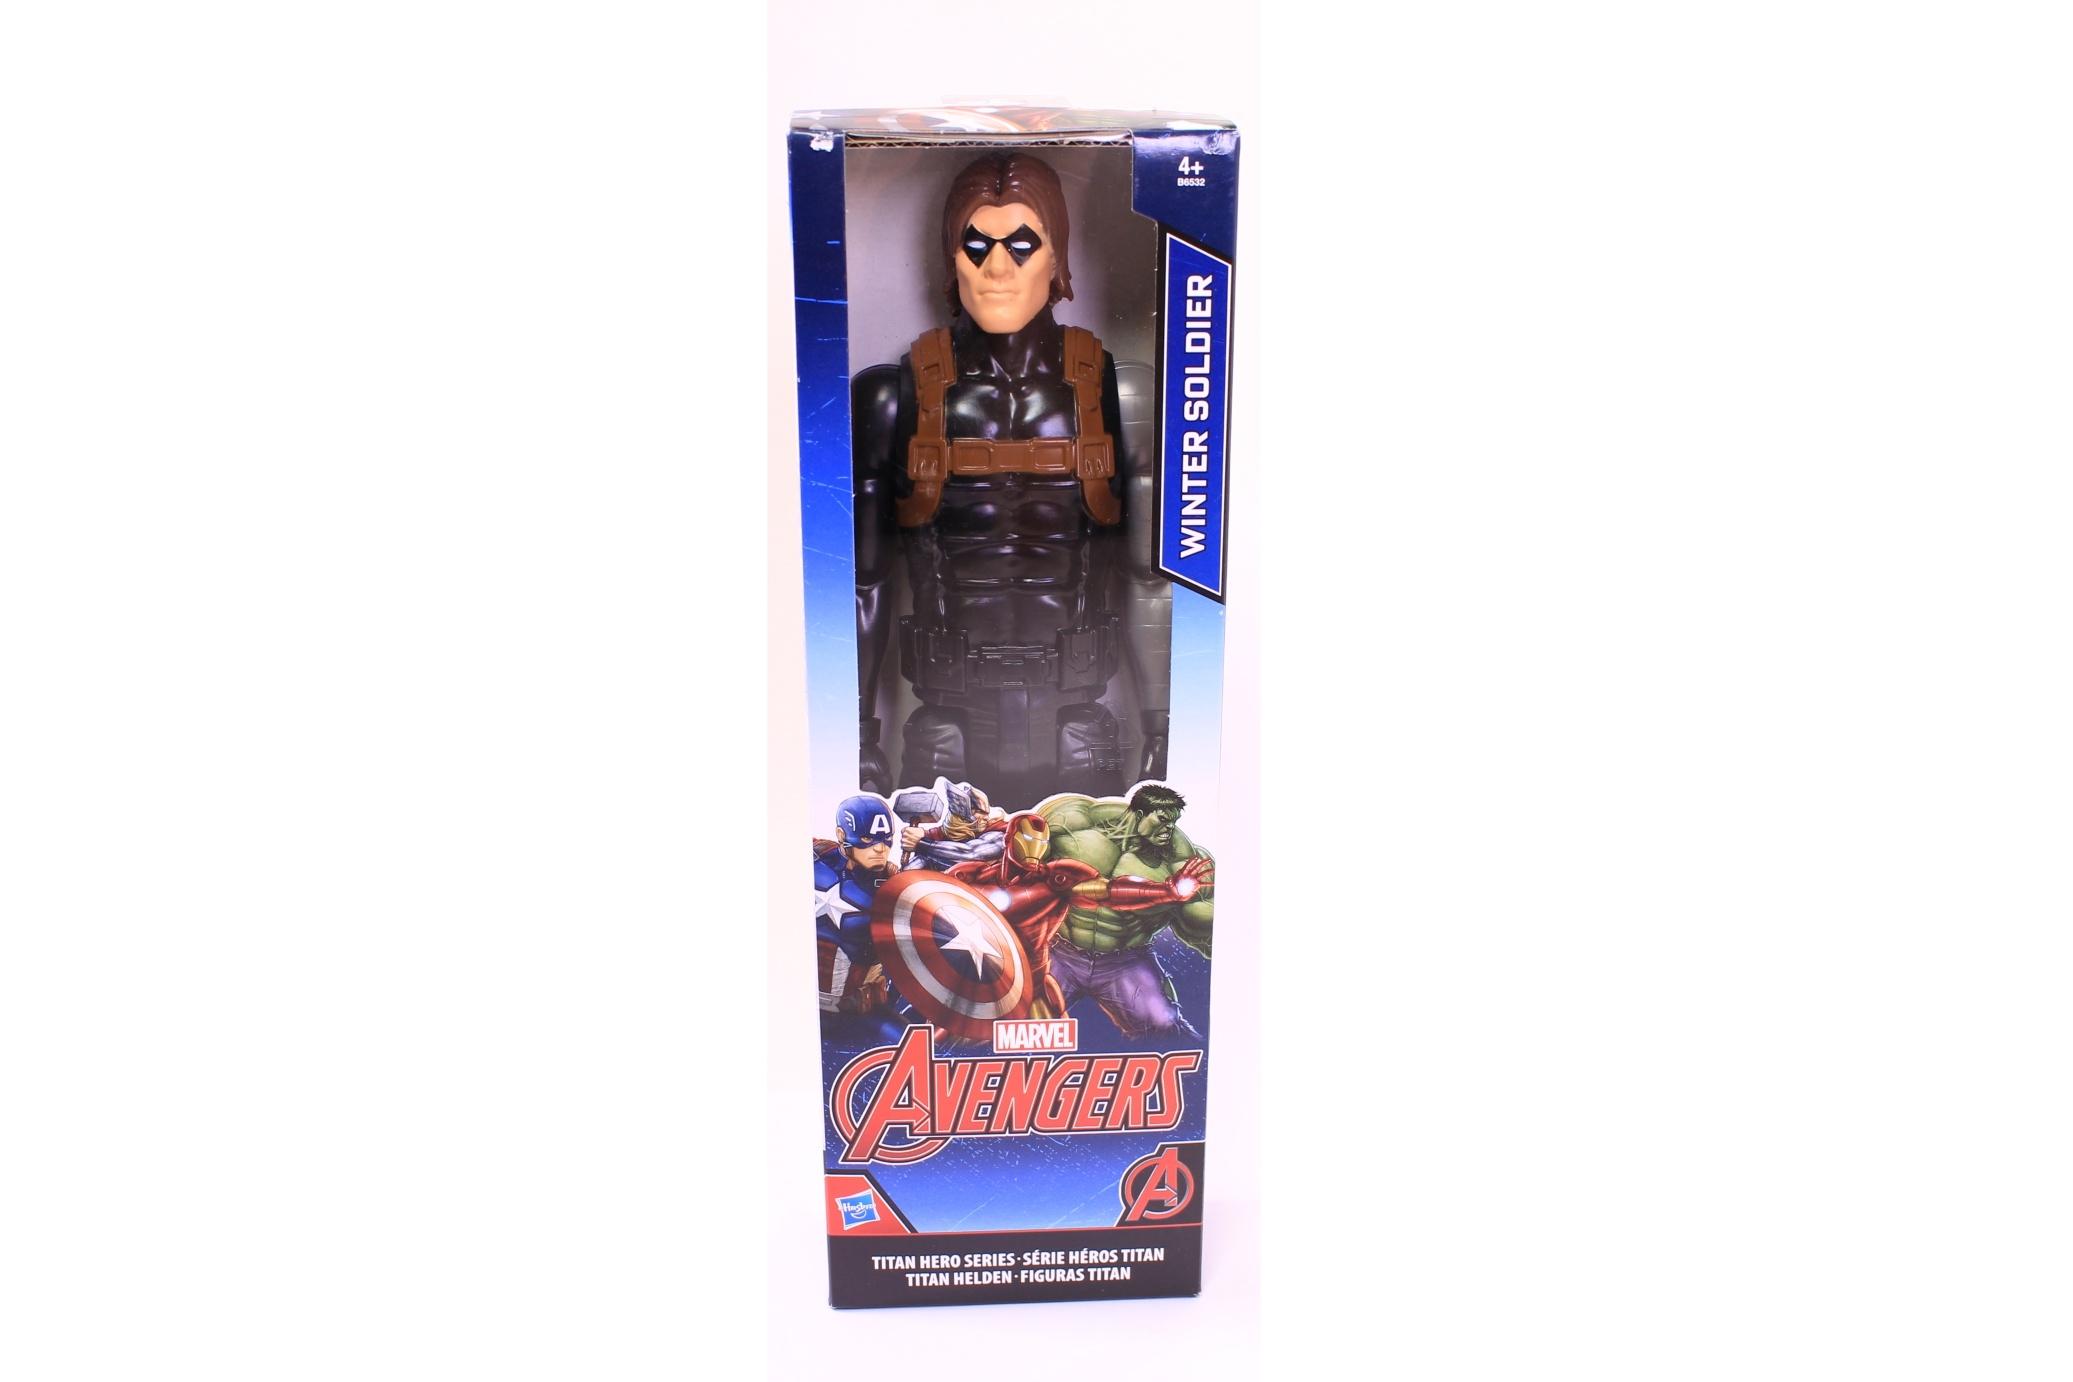 Avengers Titan action figure War Machine B6154 Hasbro 2016